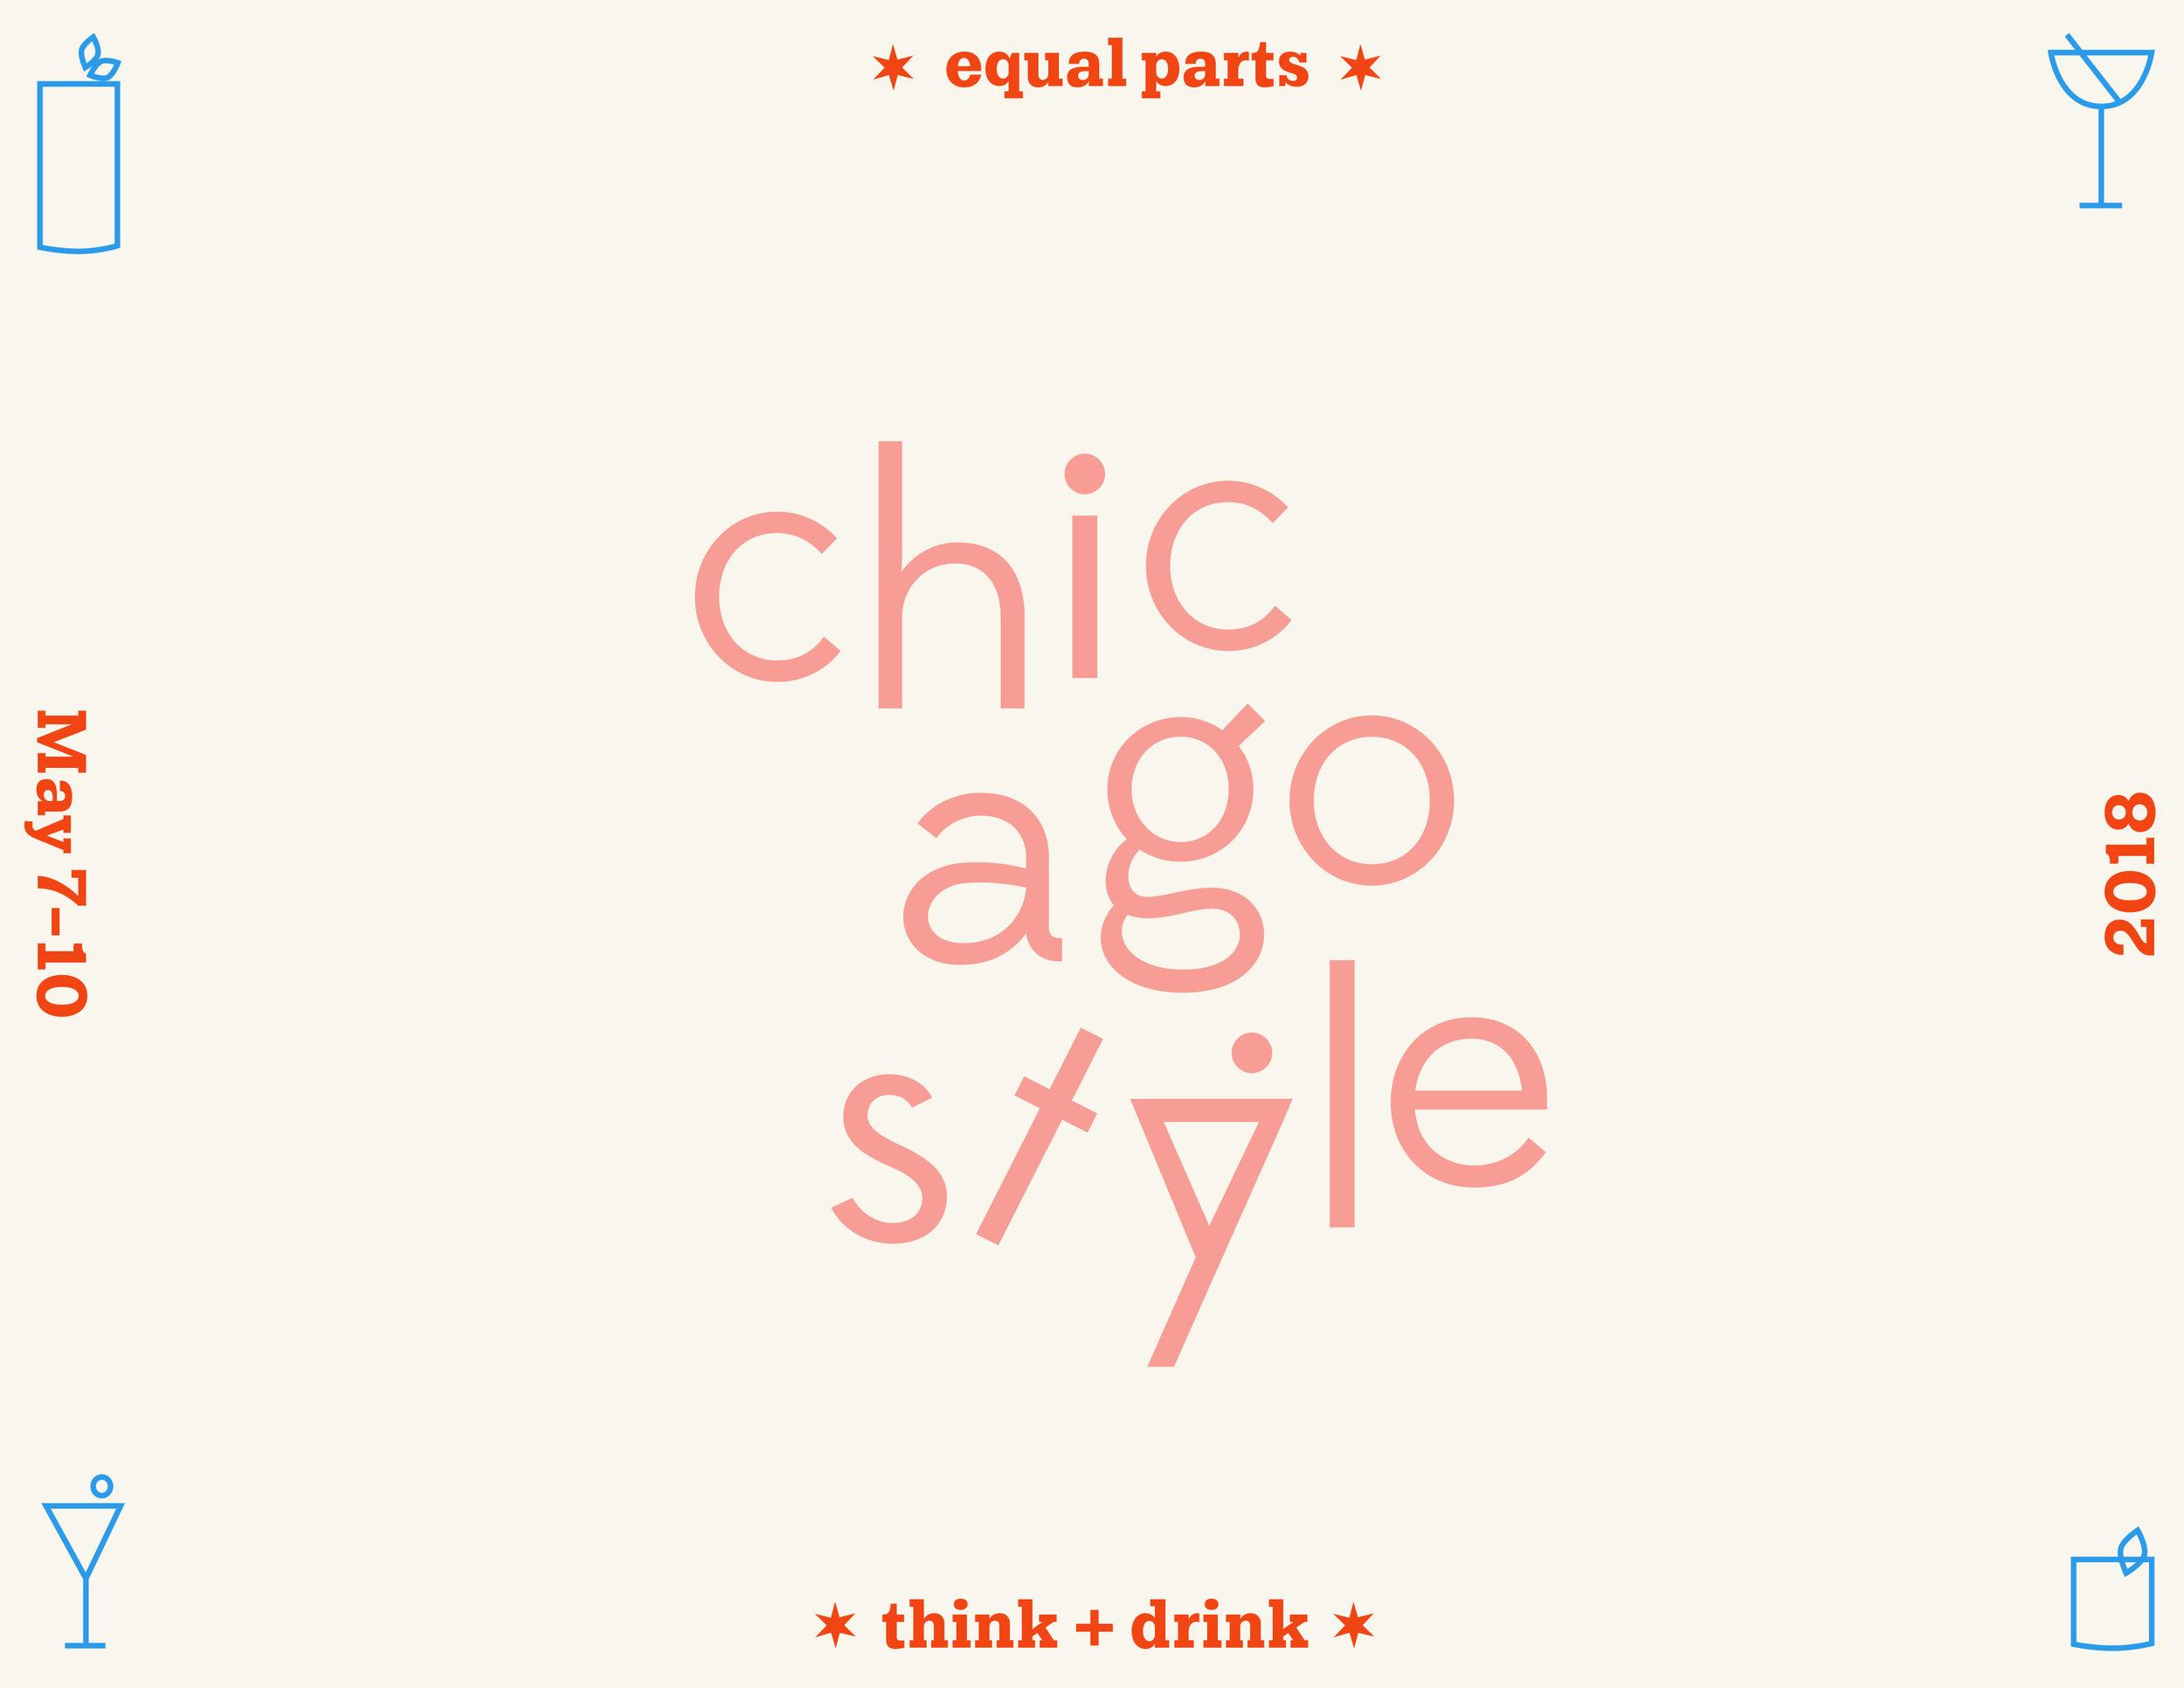 ChicagoStyle_SponsorshipDeck_0118-1.jpg